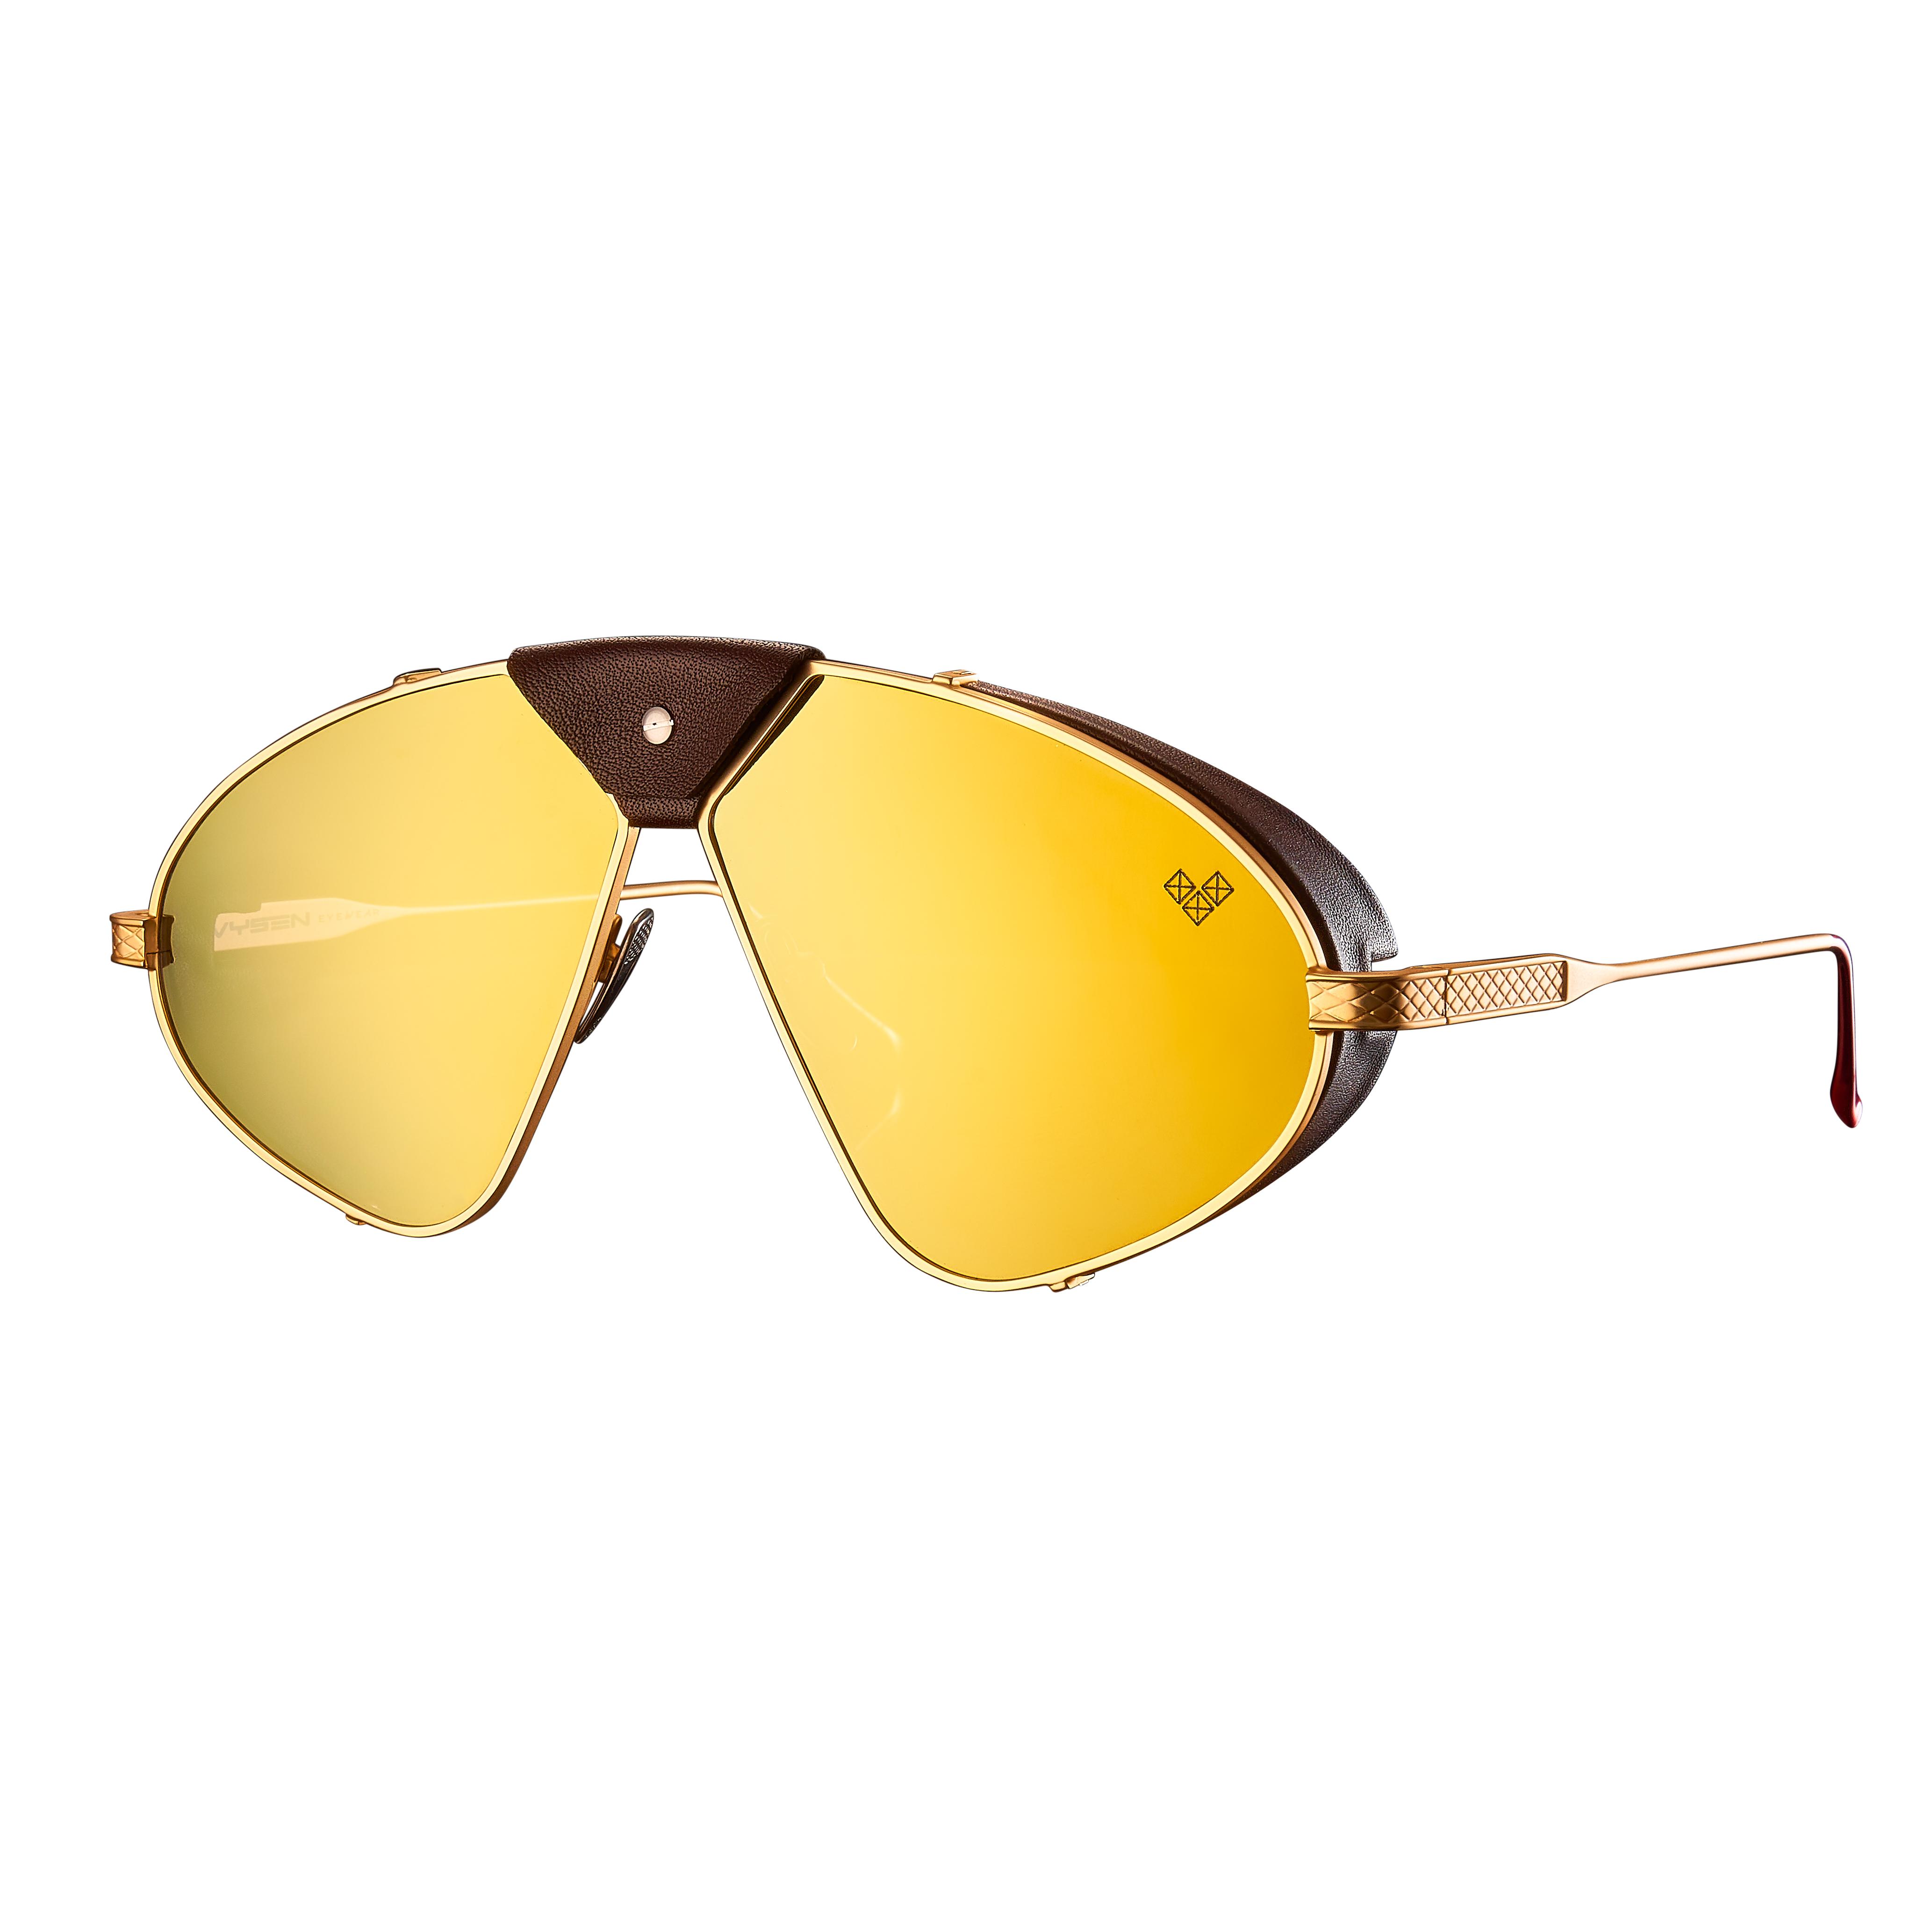 Luis Fonsi - F - 4 + Matte Gold Frame + Gold Mirror Lenses + Dark Brown Leather